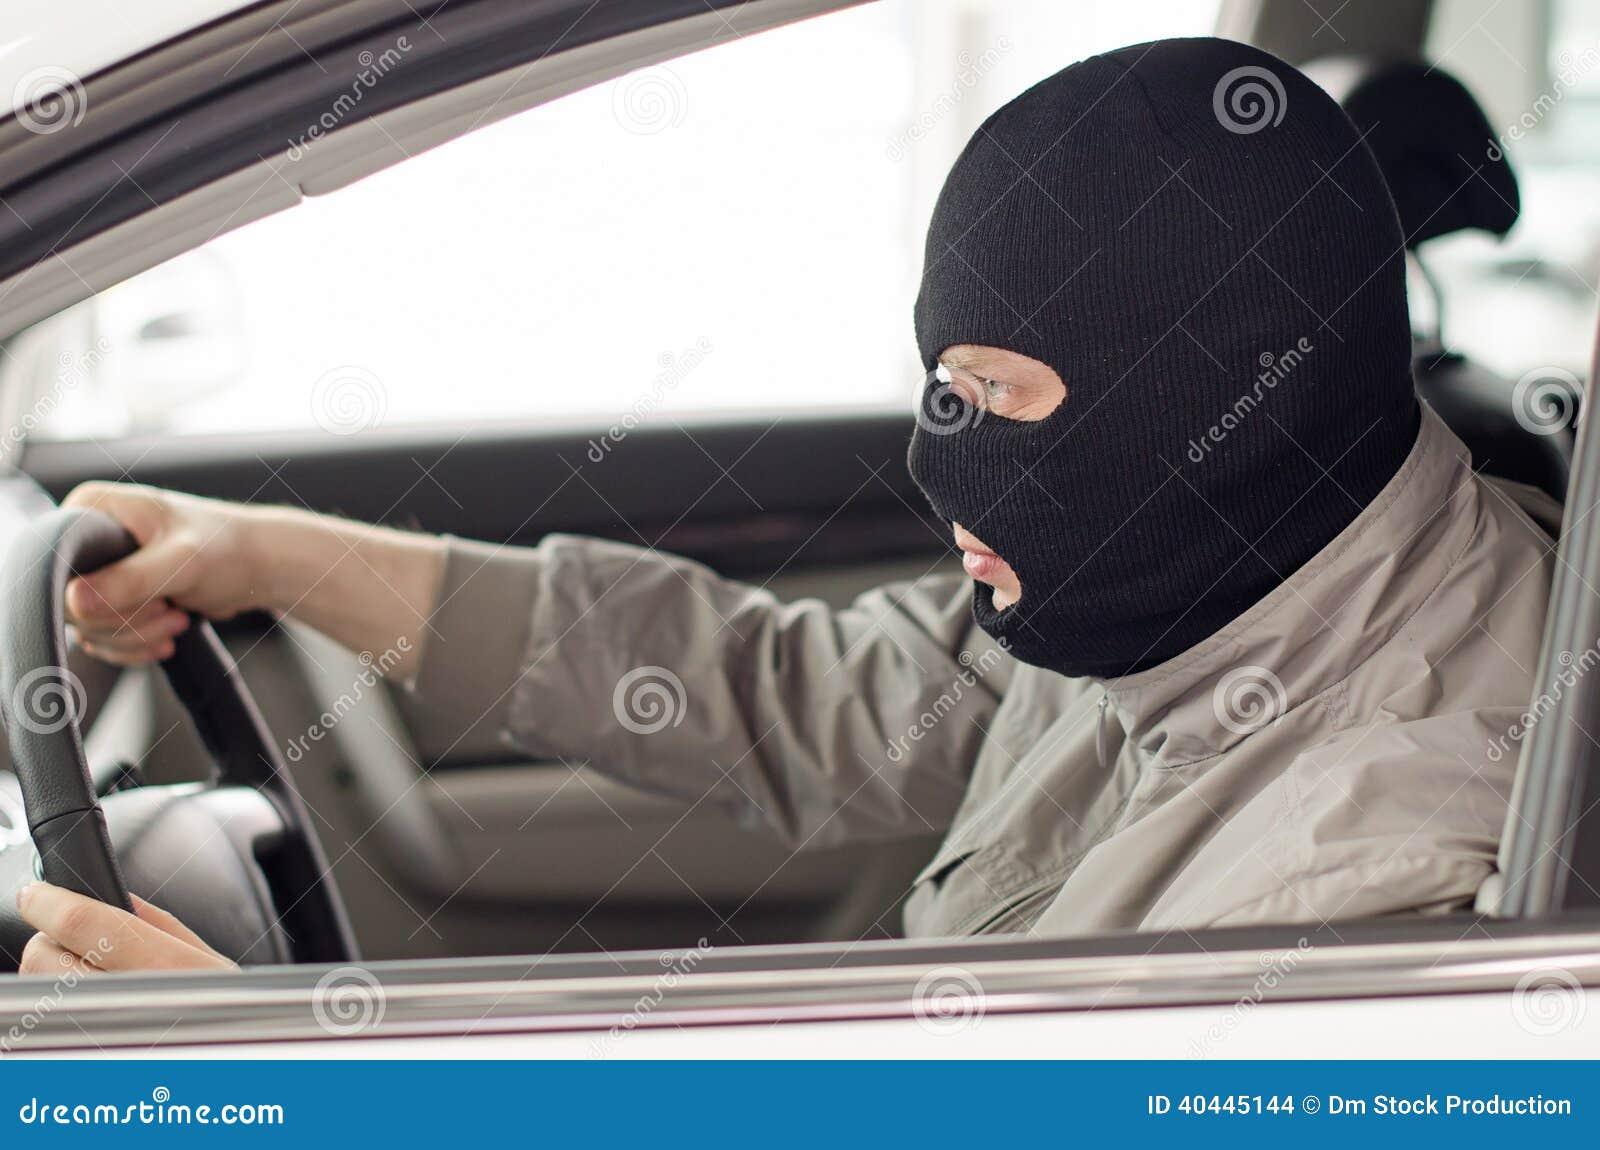 Thief in mask steals car.